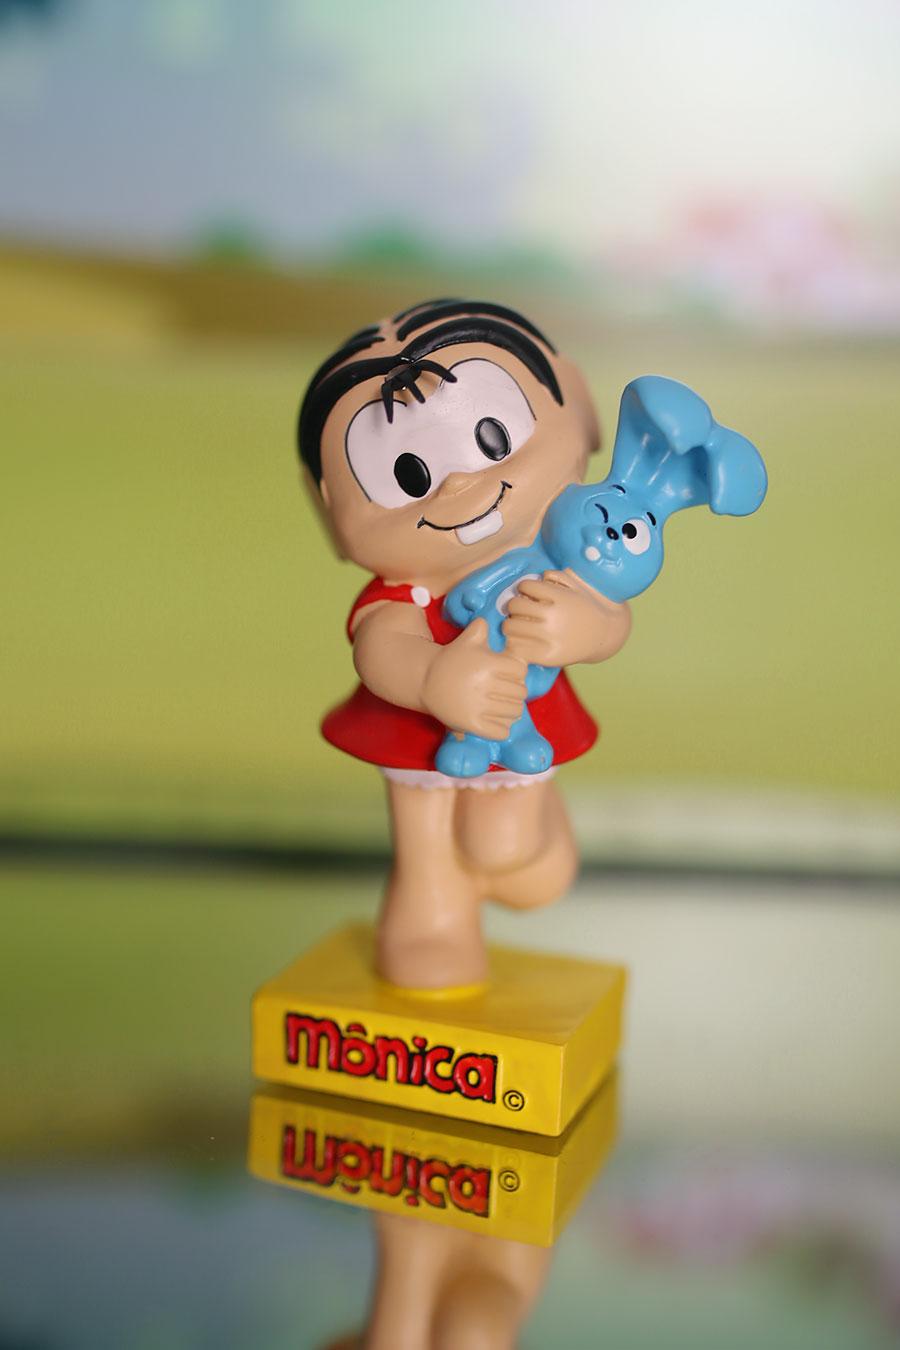 turma-da-monica-miniatura-002